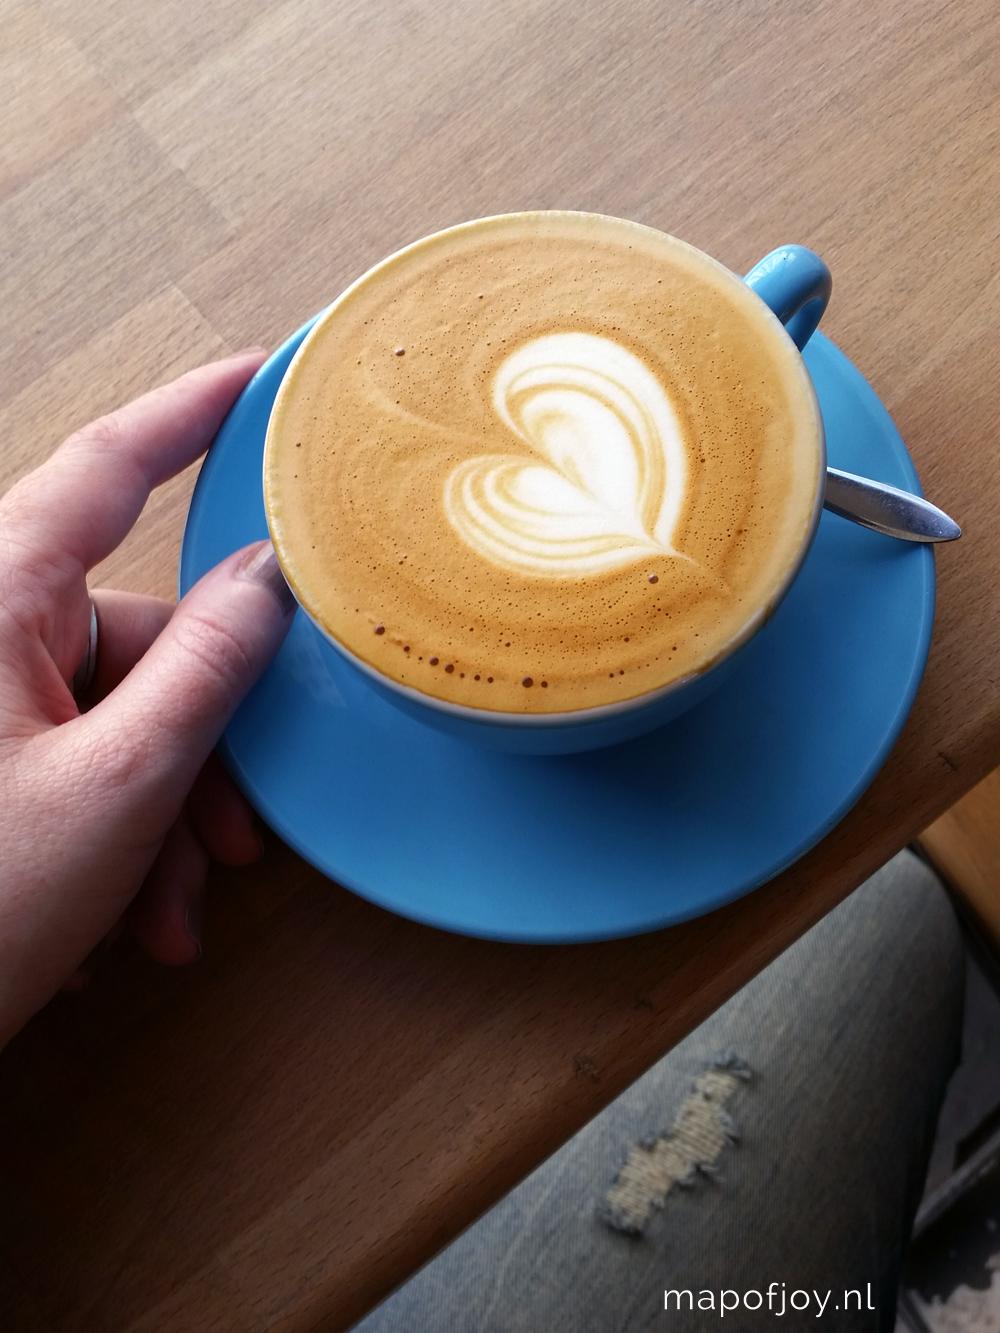 Cream coffee, Paris - Map of Joy